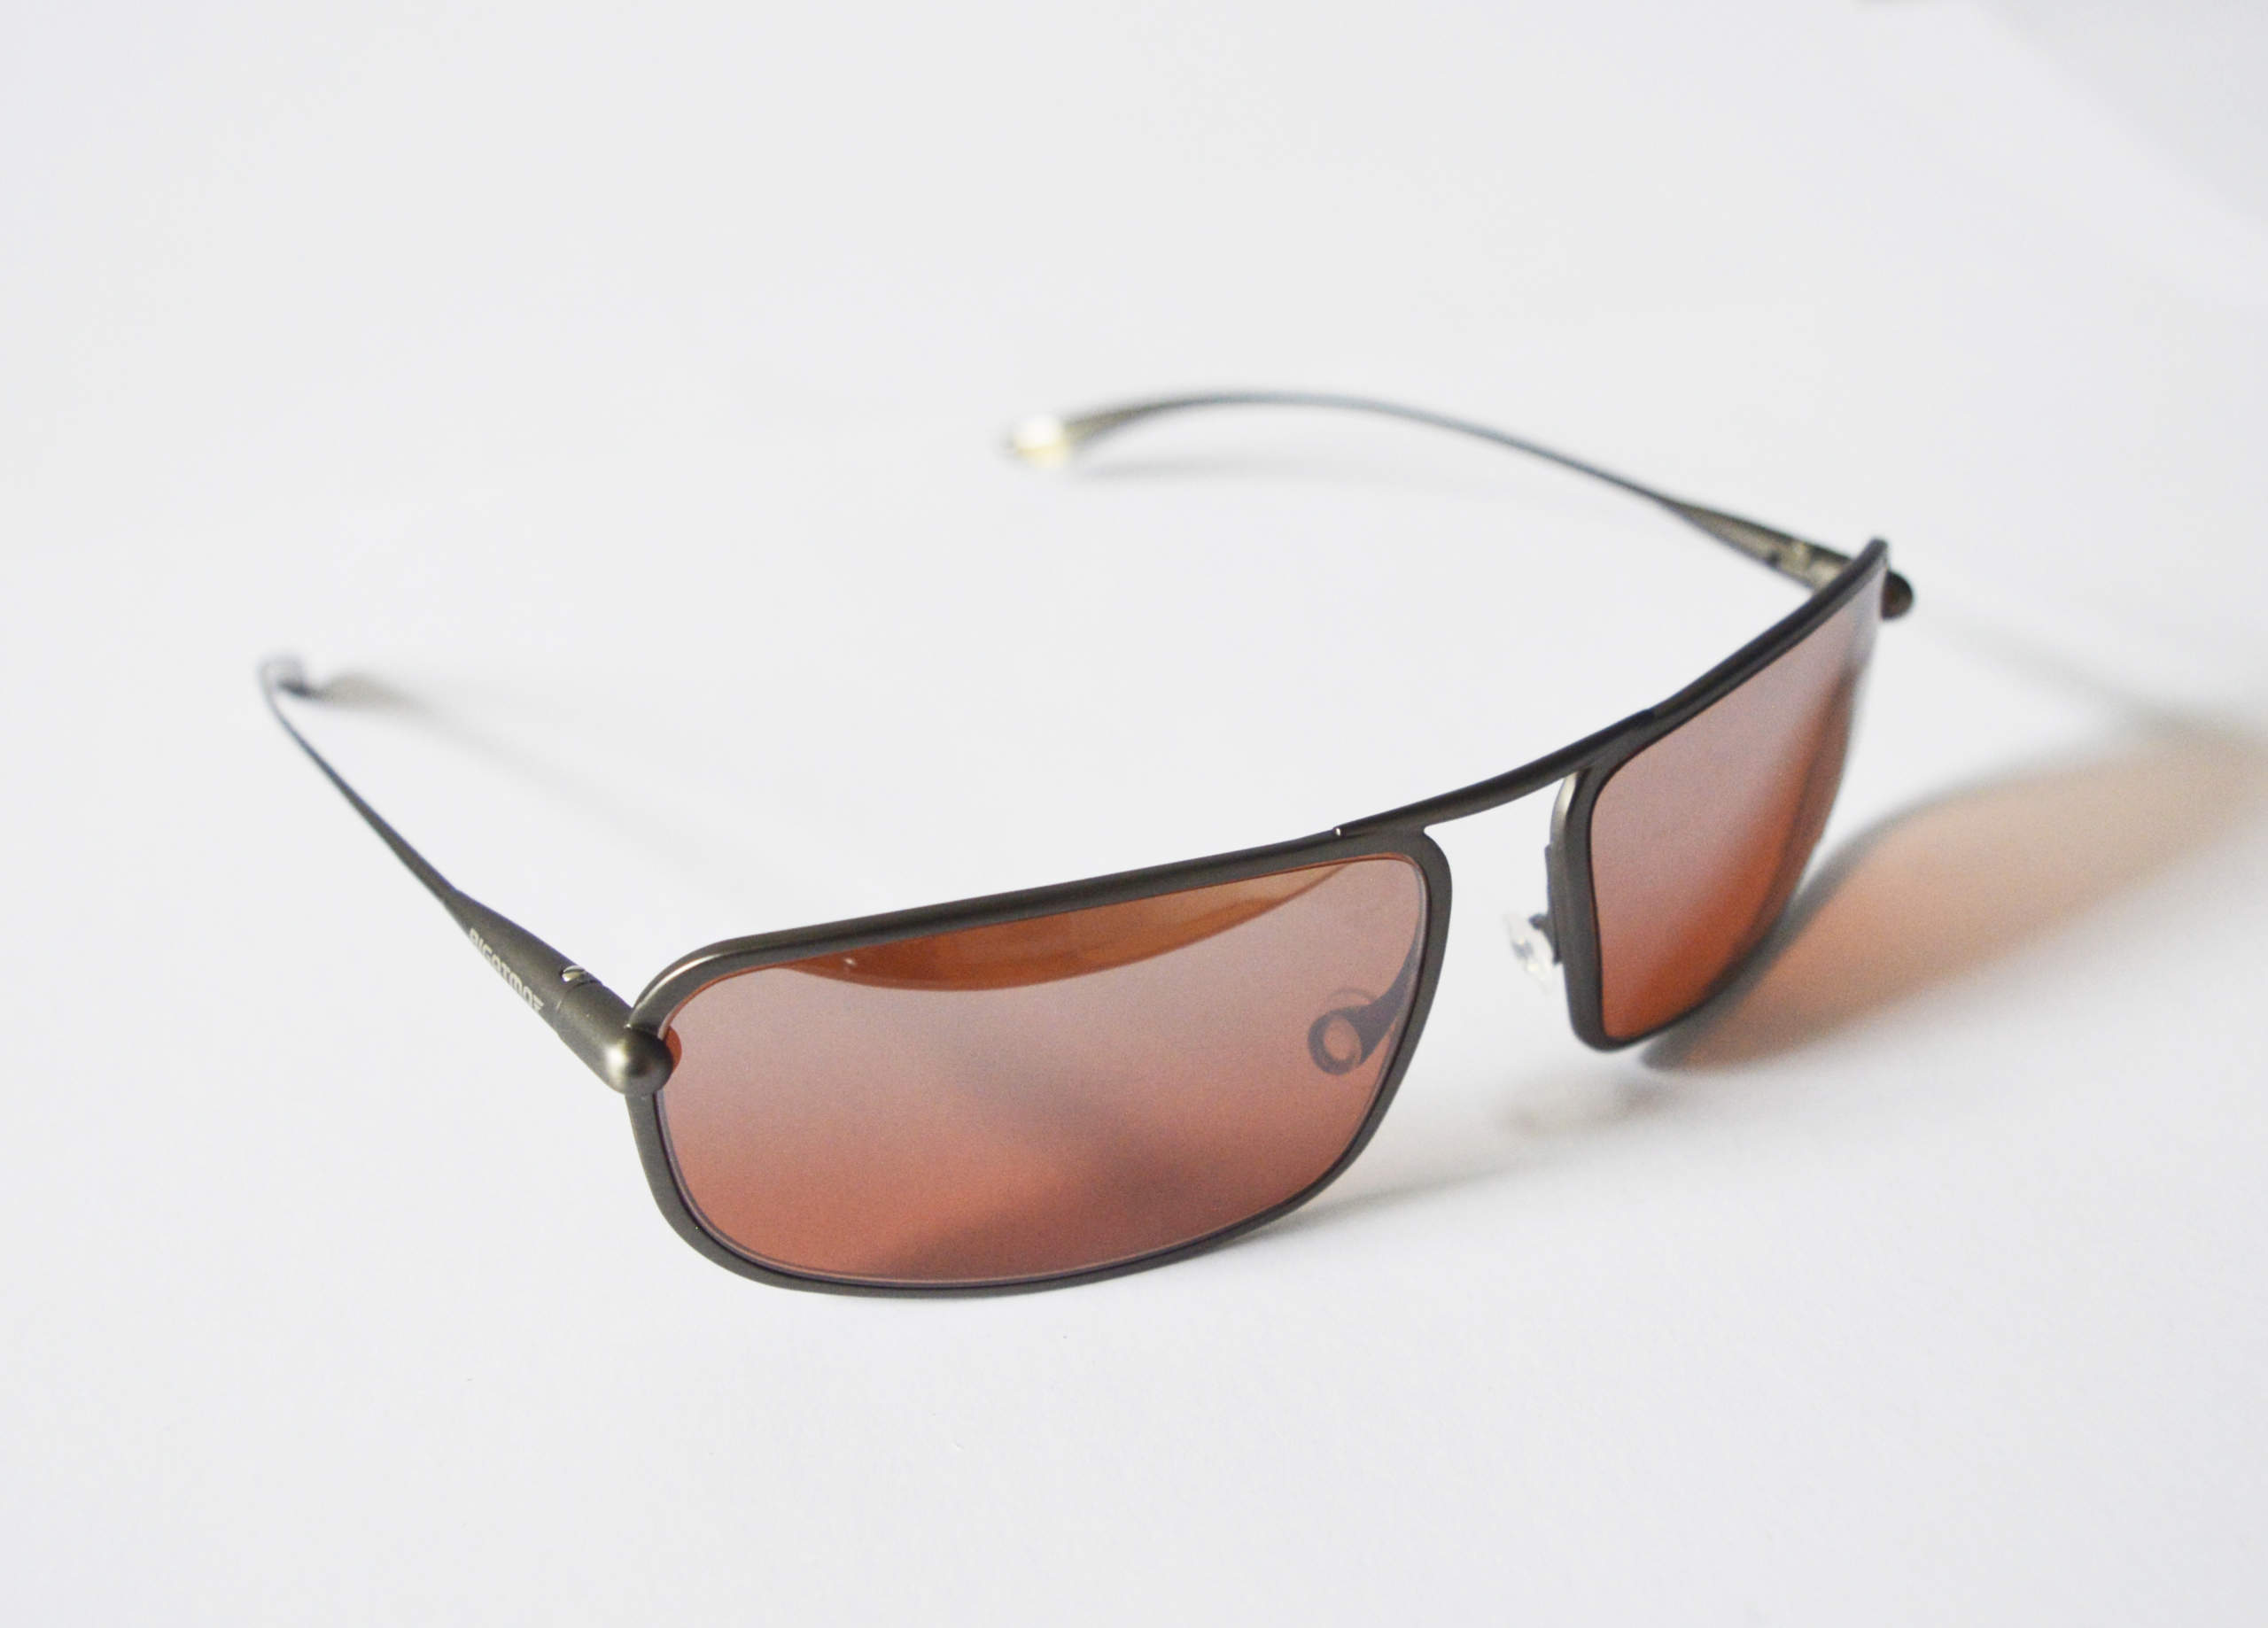 Meso - Gunmetal Titanium Frame Light Silver Gradient Mirror Photochromic Sunglasses